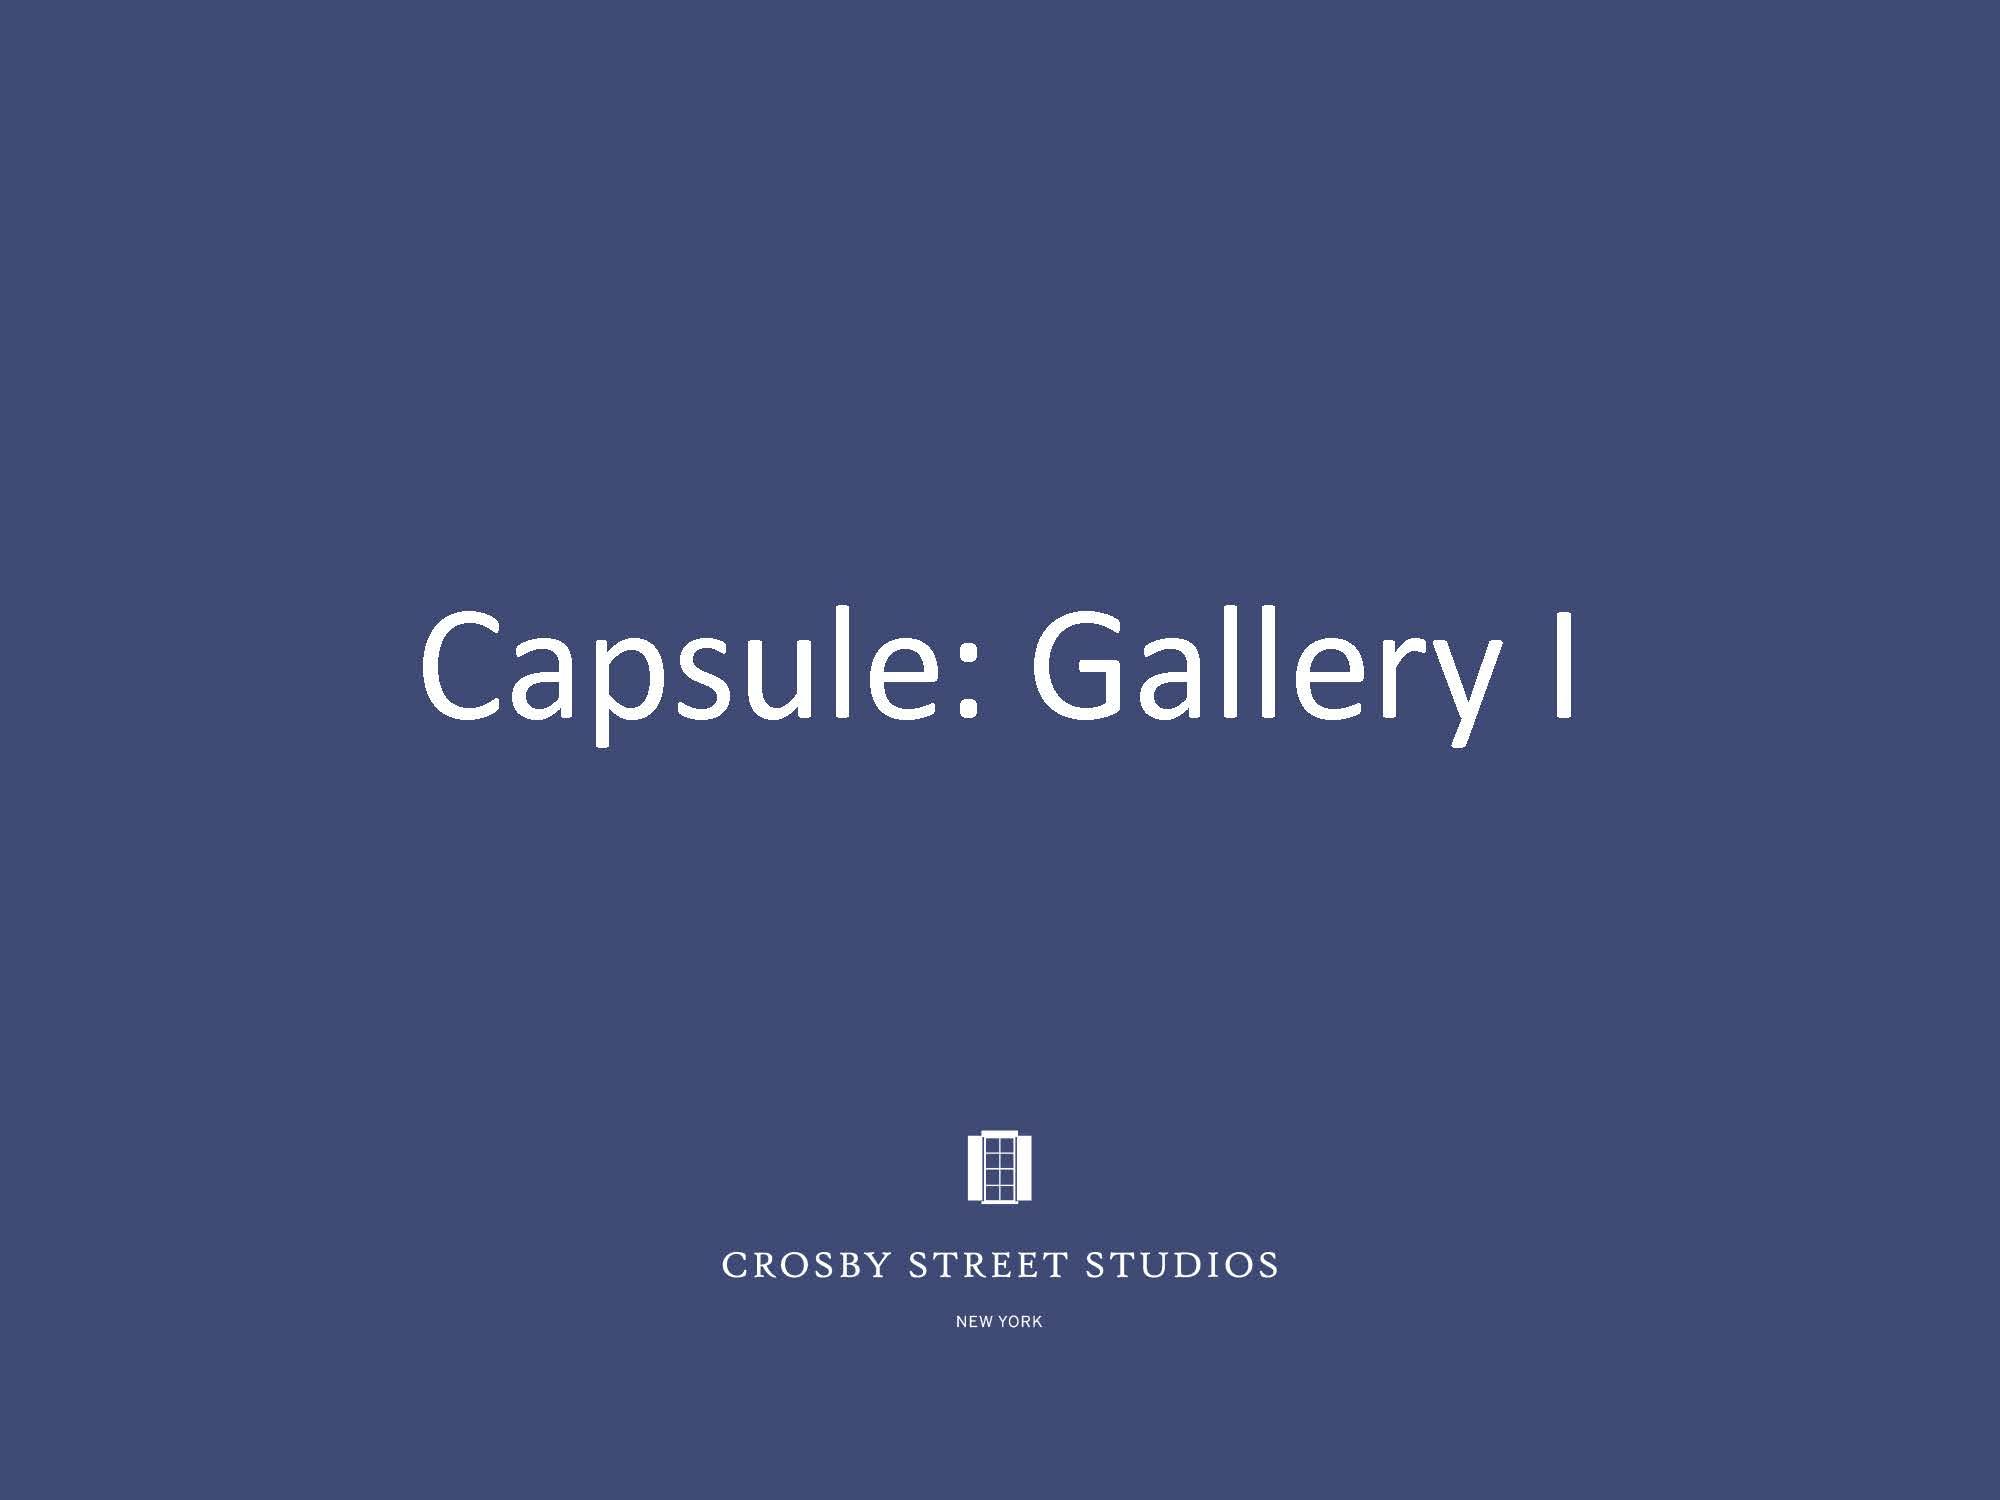 Crosby Street Studio Catalog_Capsule Gallery 1 Cover